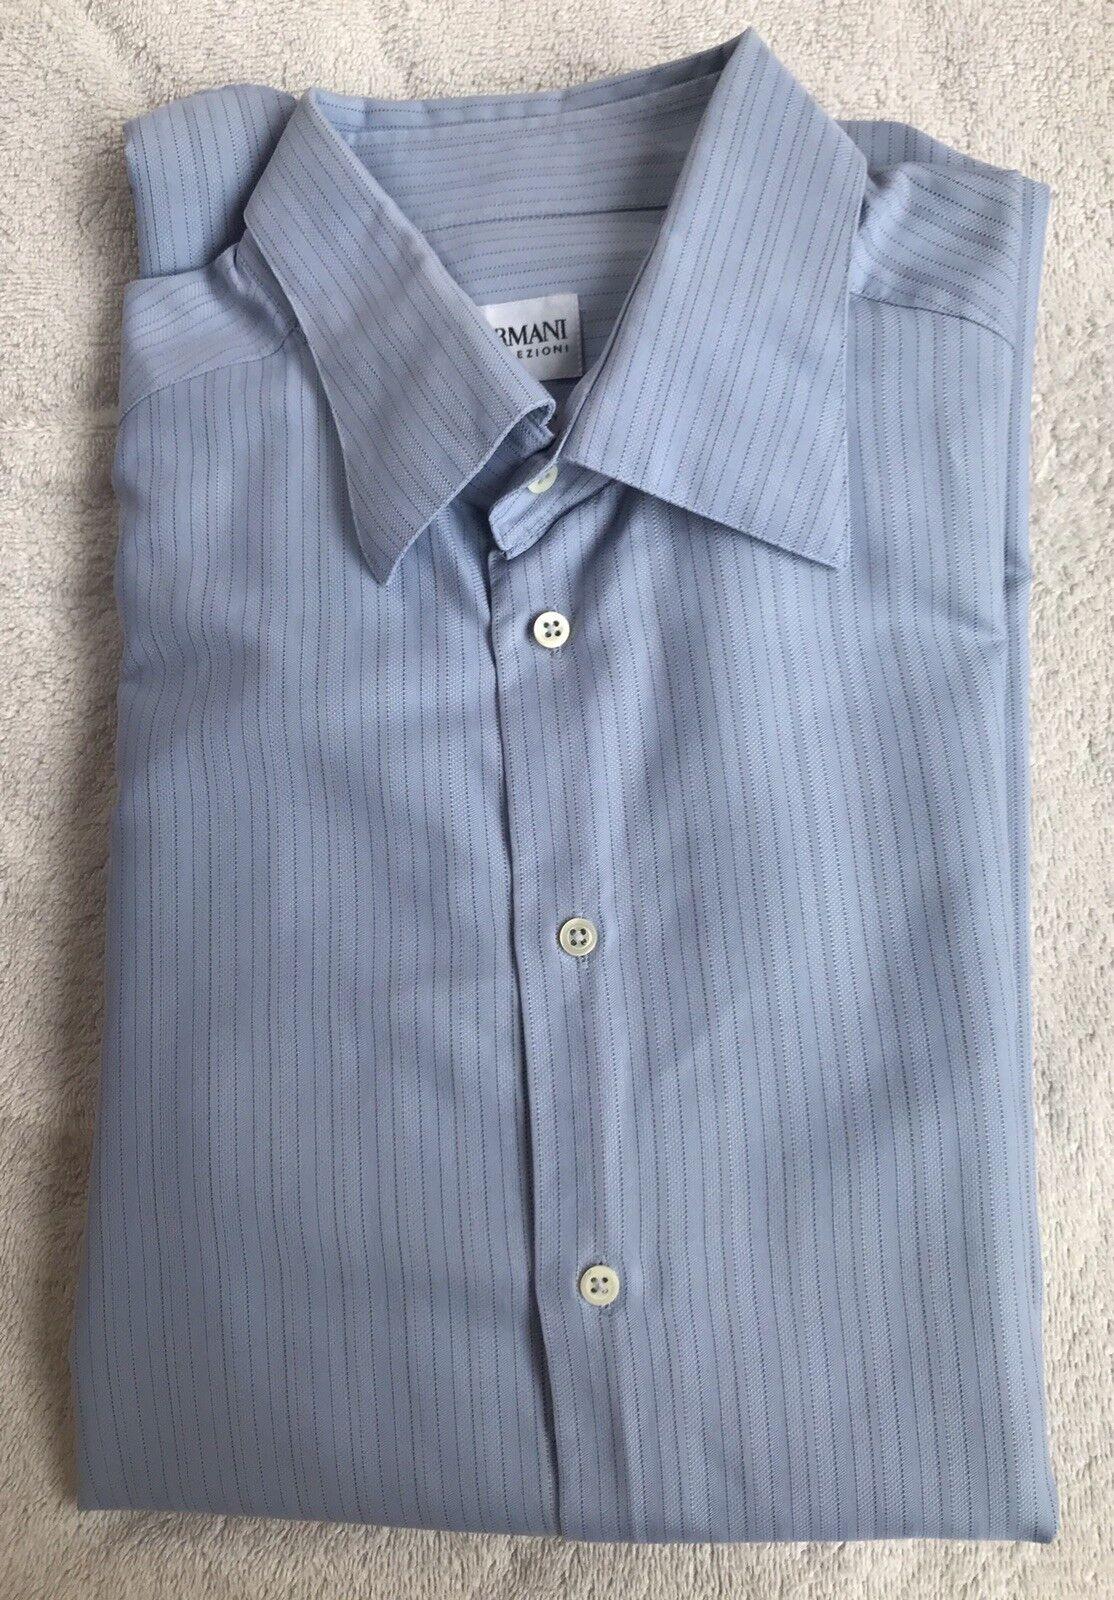 Armani Collezioni Men'sDesignerShirt - Light bluee Stripes - 17.5 Collar